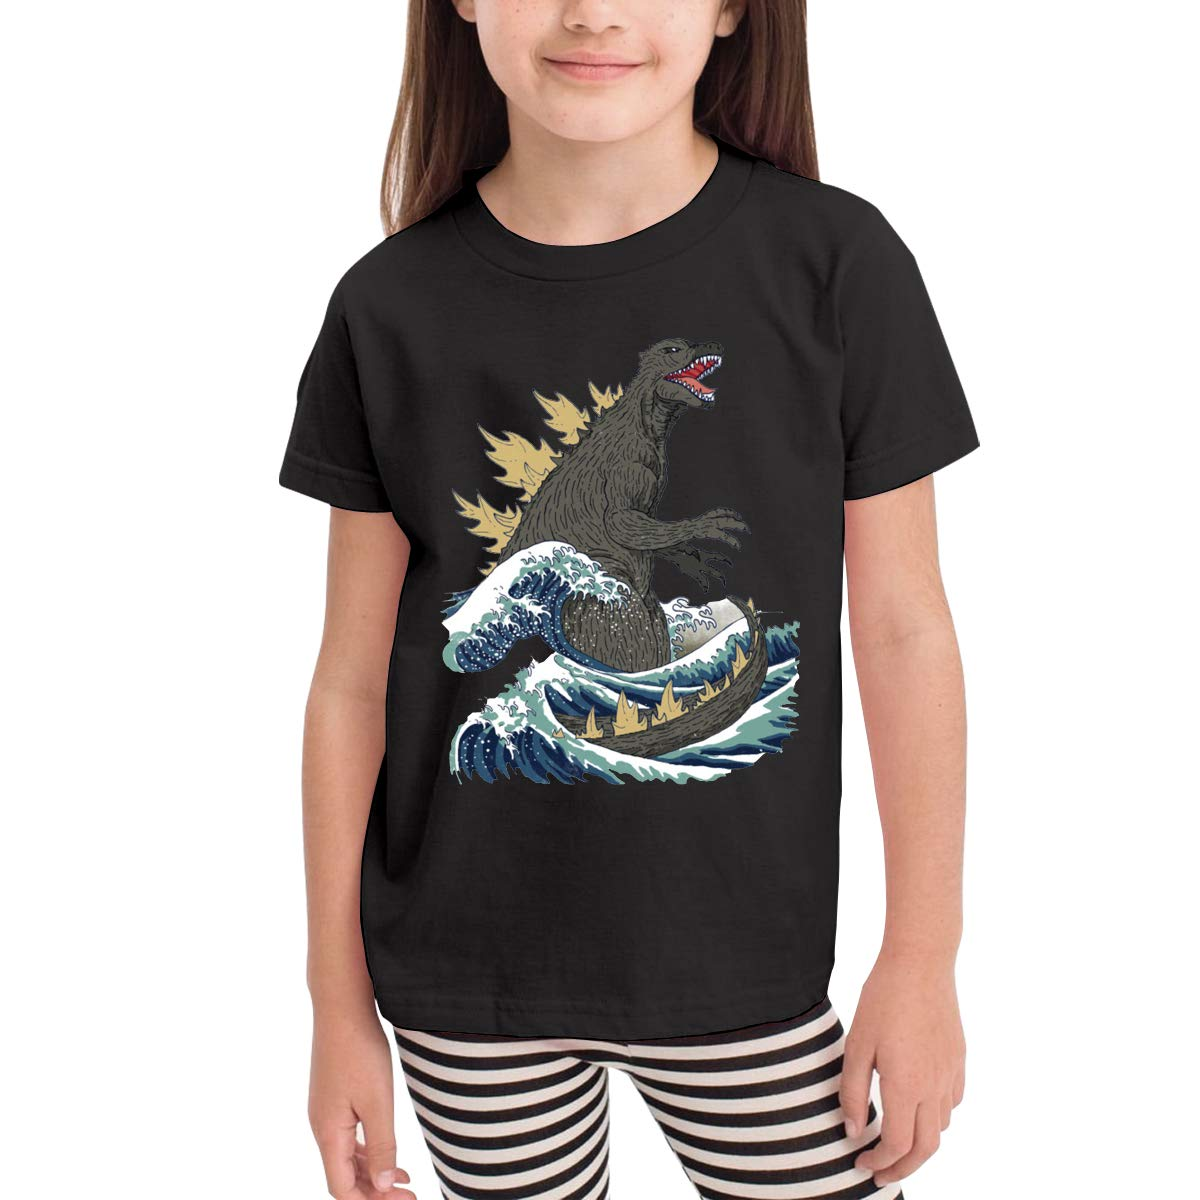 Kaddias The Great God Zilla Off Kanagawa Infant Soft Short Sleeve Tshirt 1502